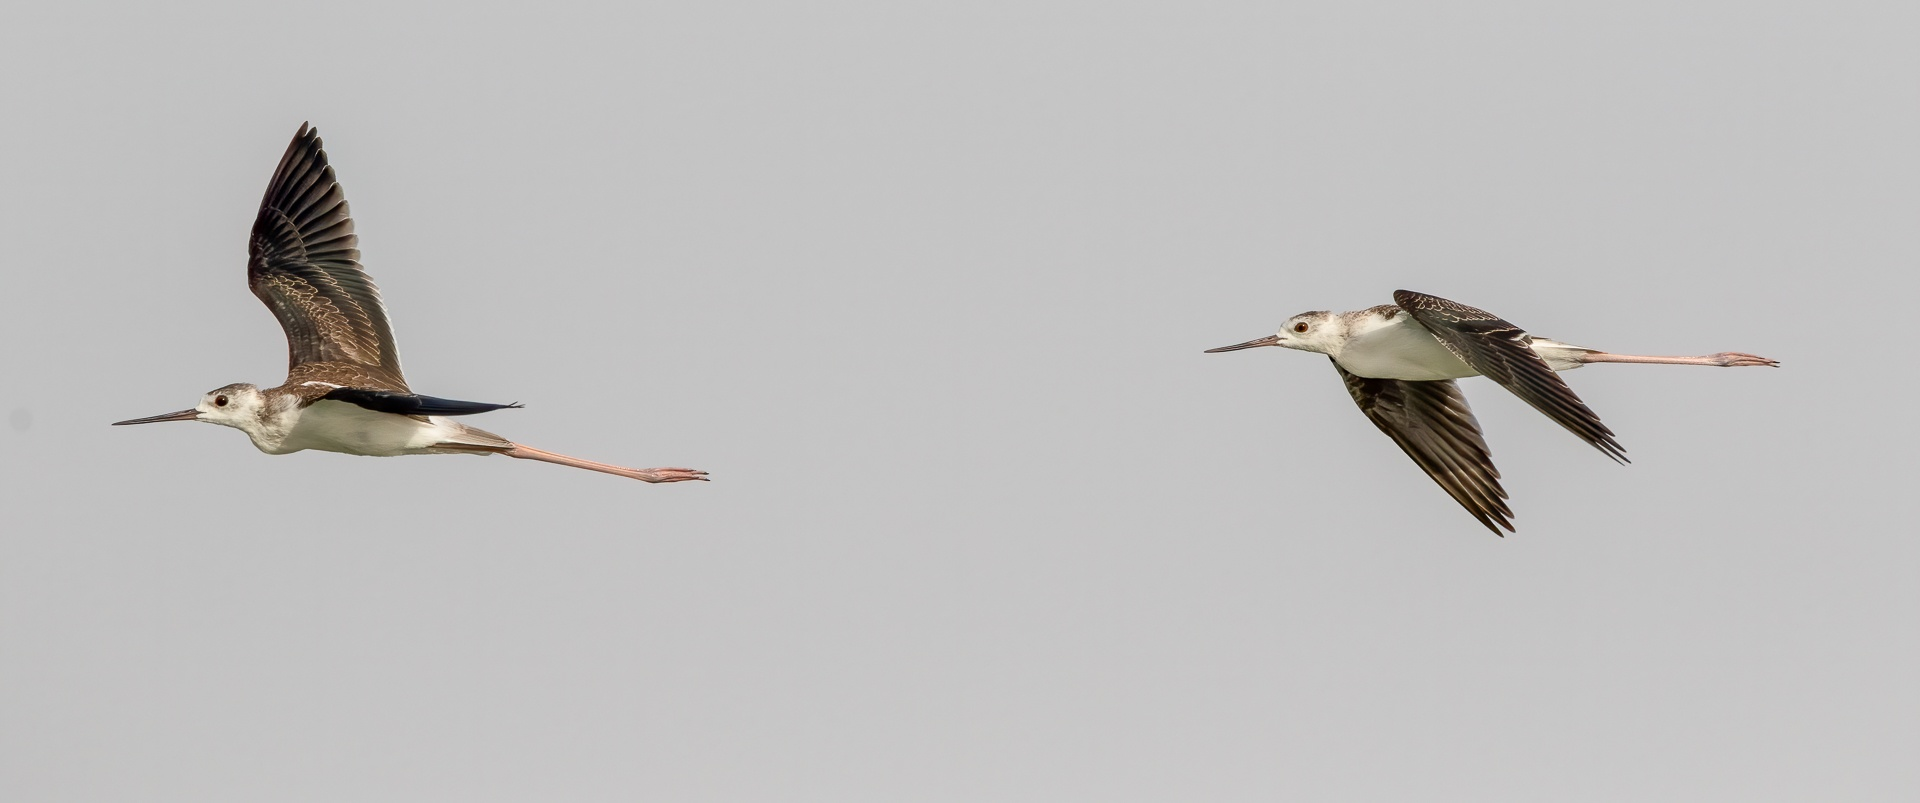 Pair of juvenile black-winged stilts